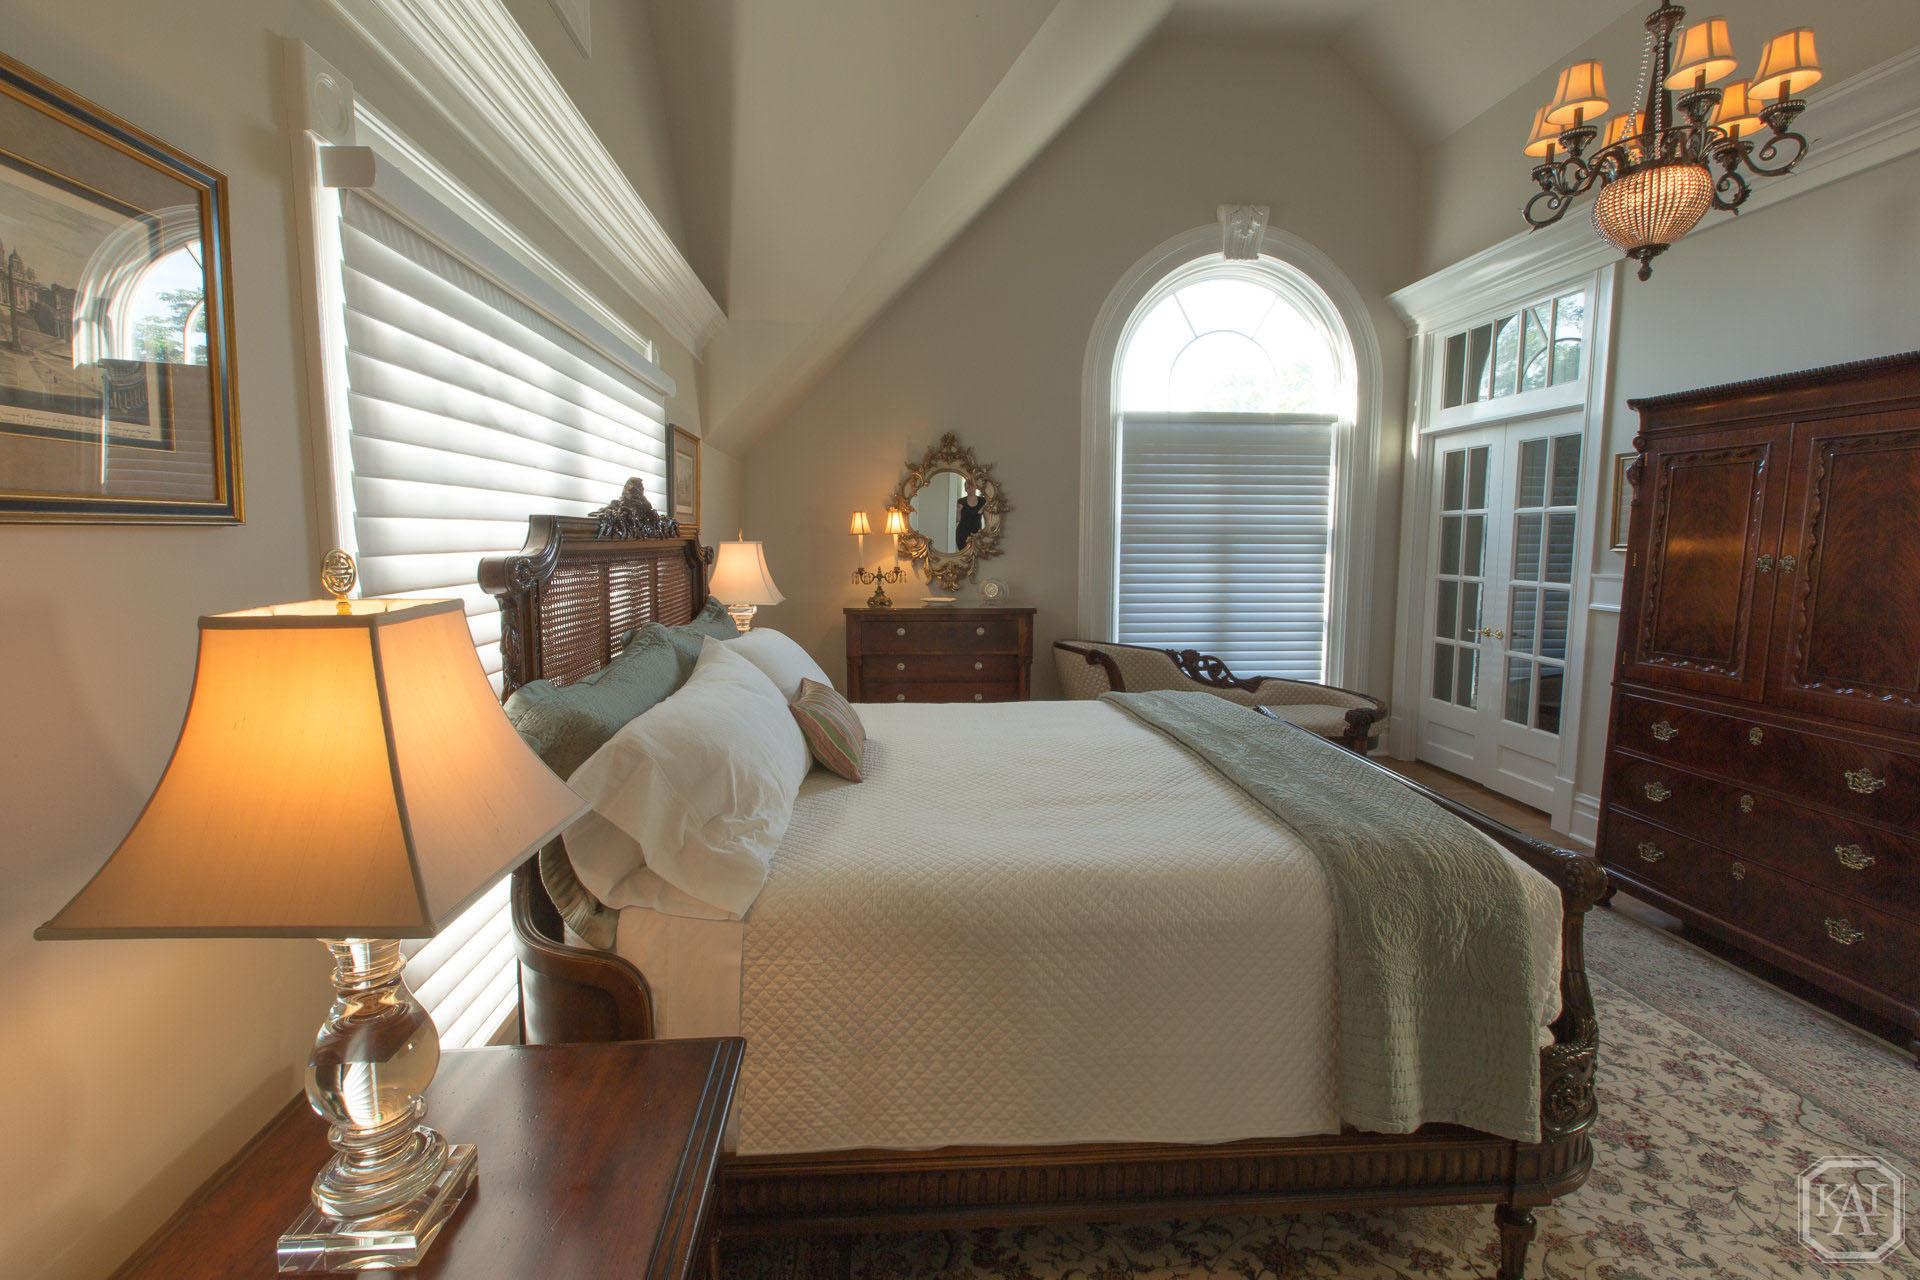 Bedroom-0064.jpg